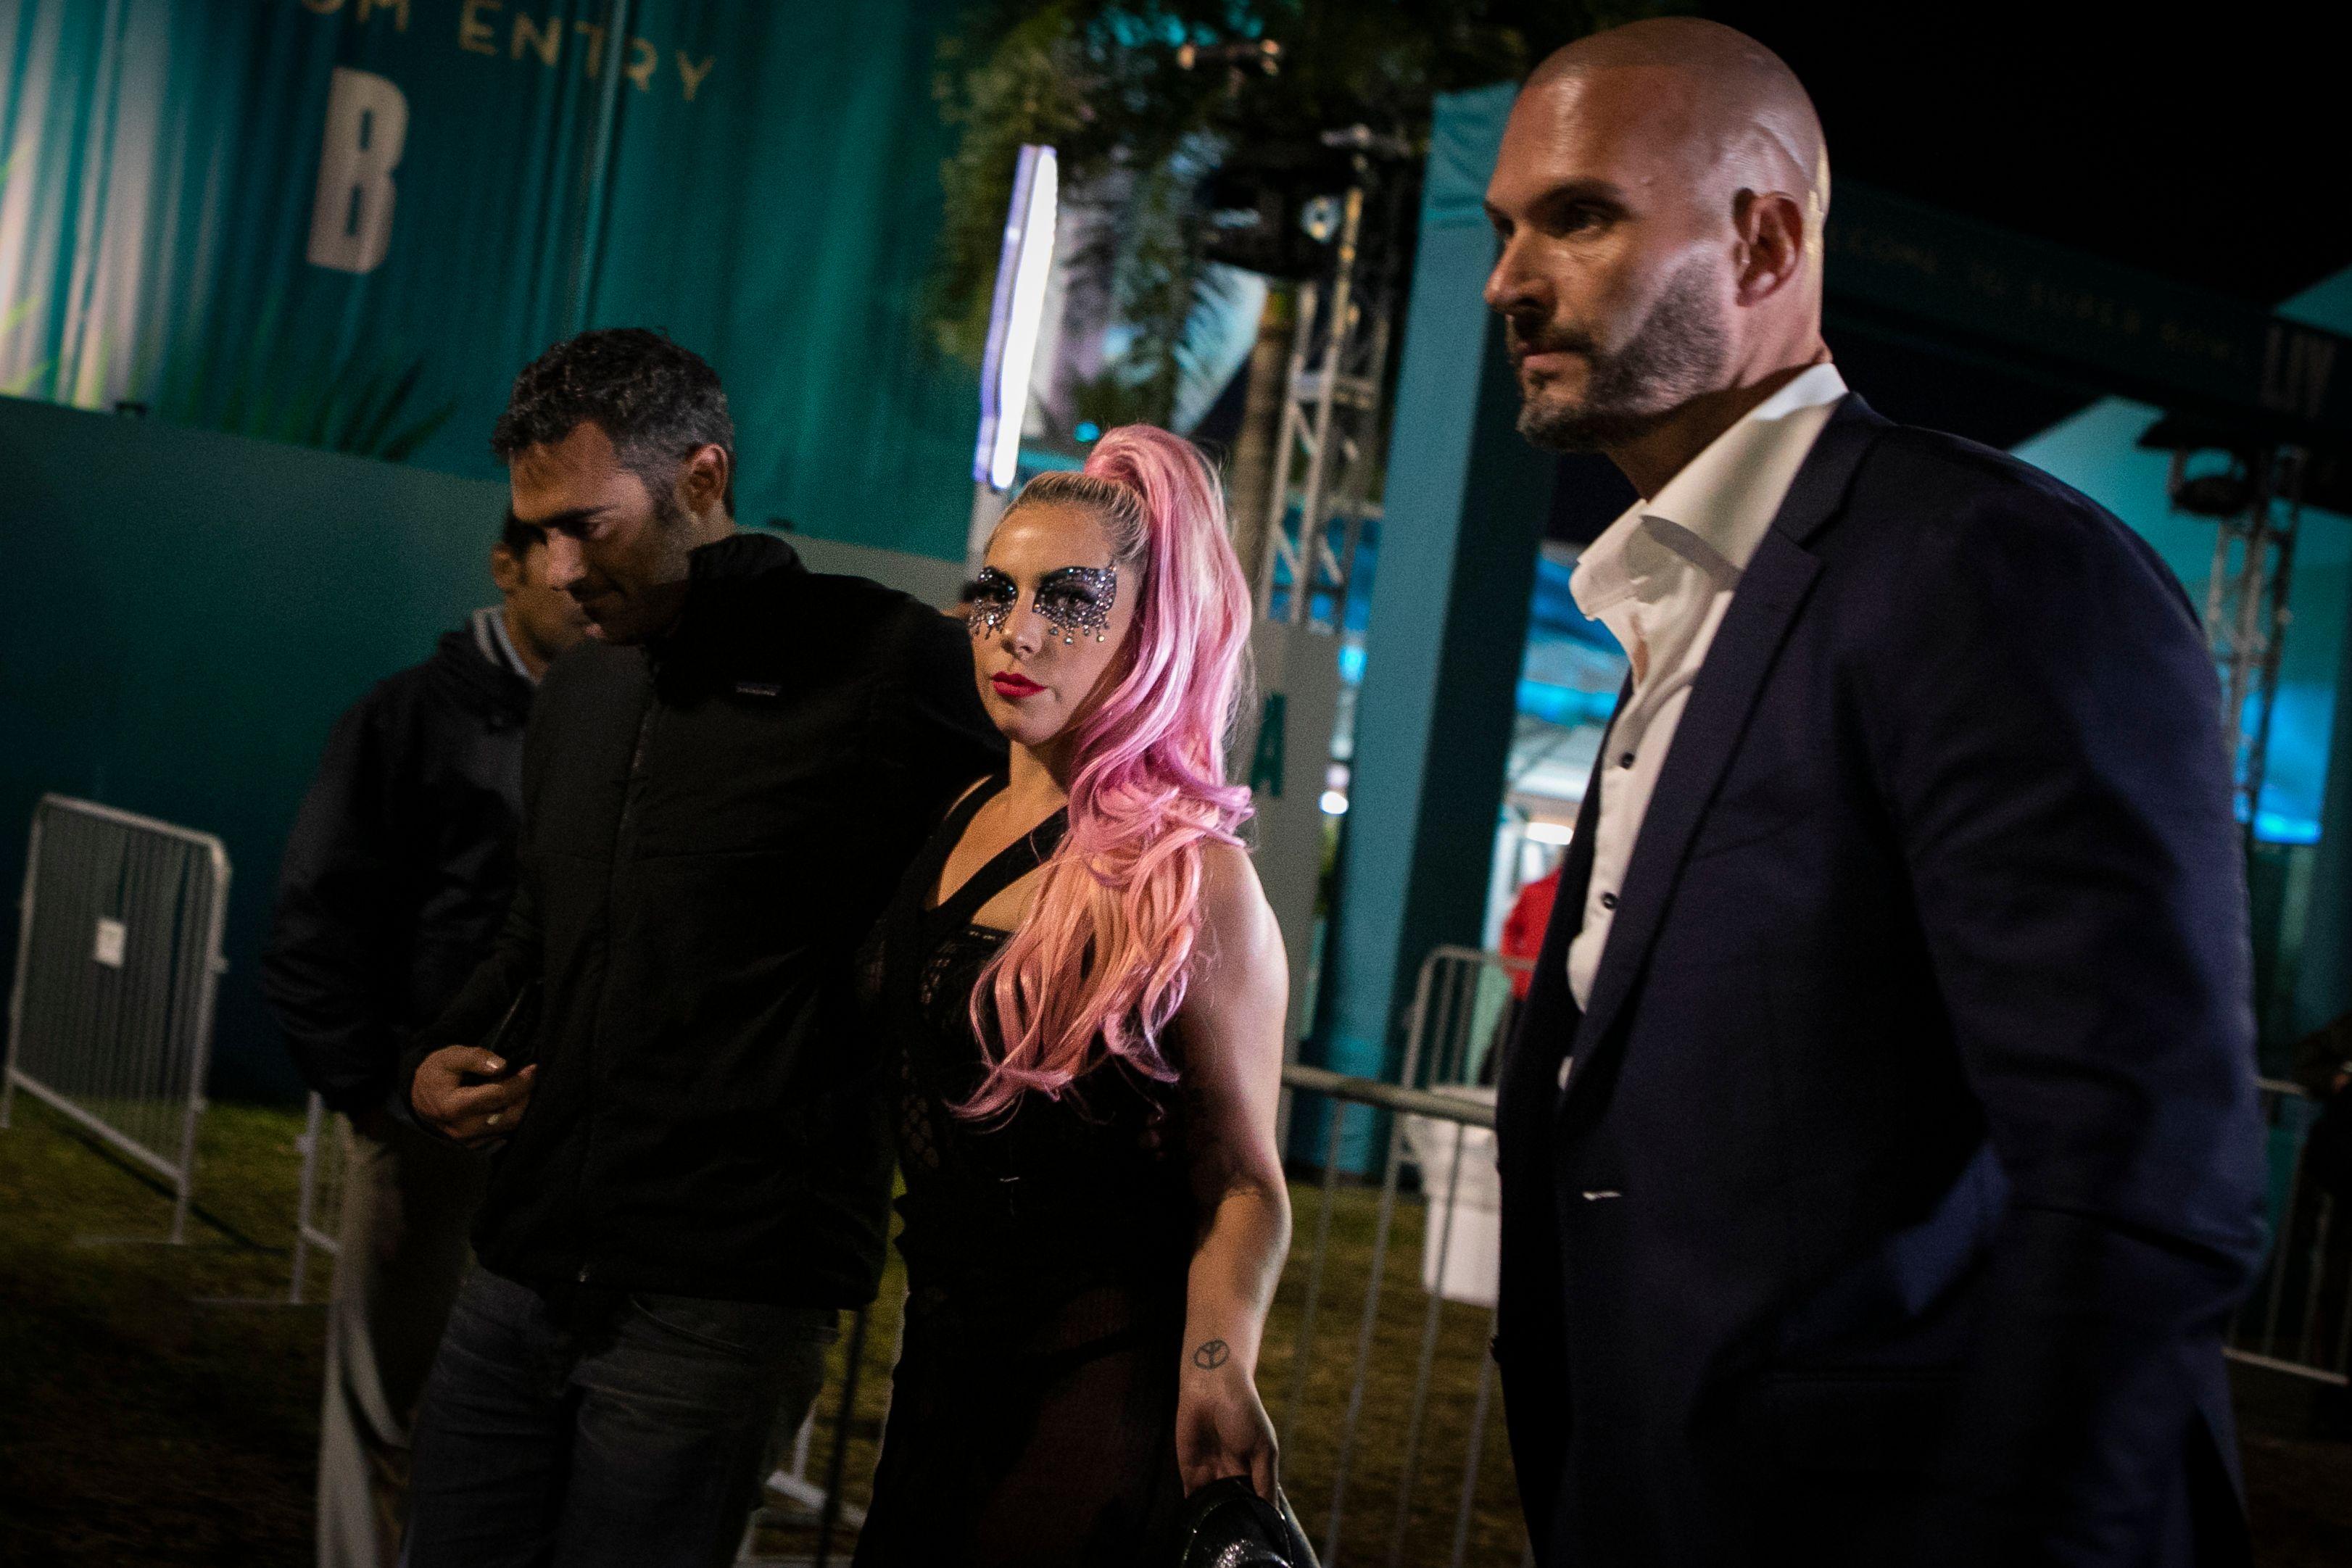 Lasdy Gaga and Michael Polansky in Miami